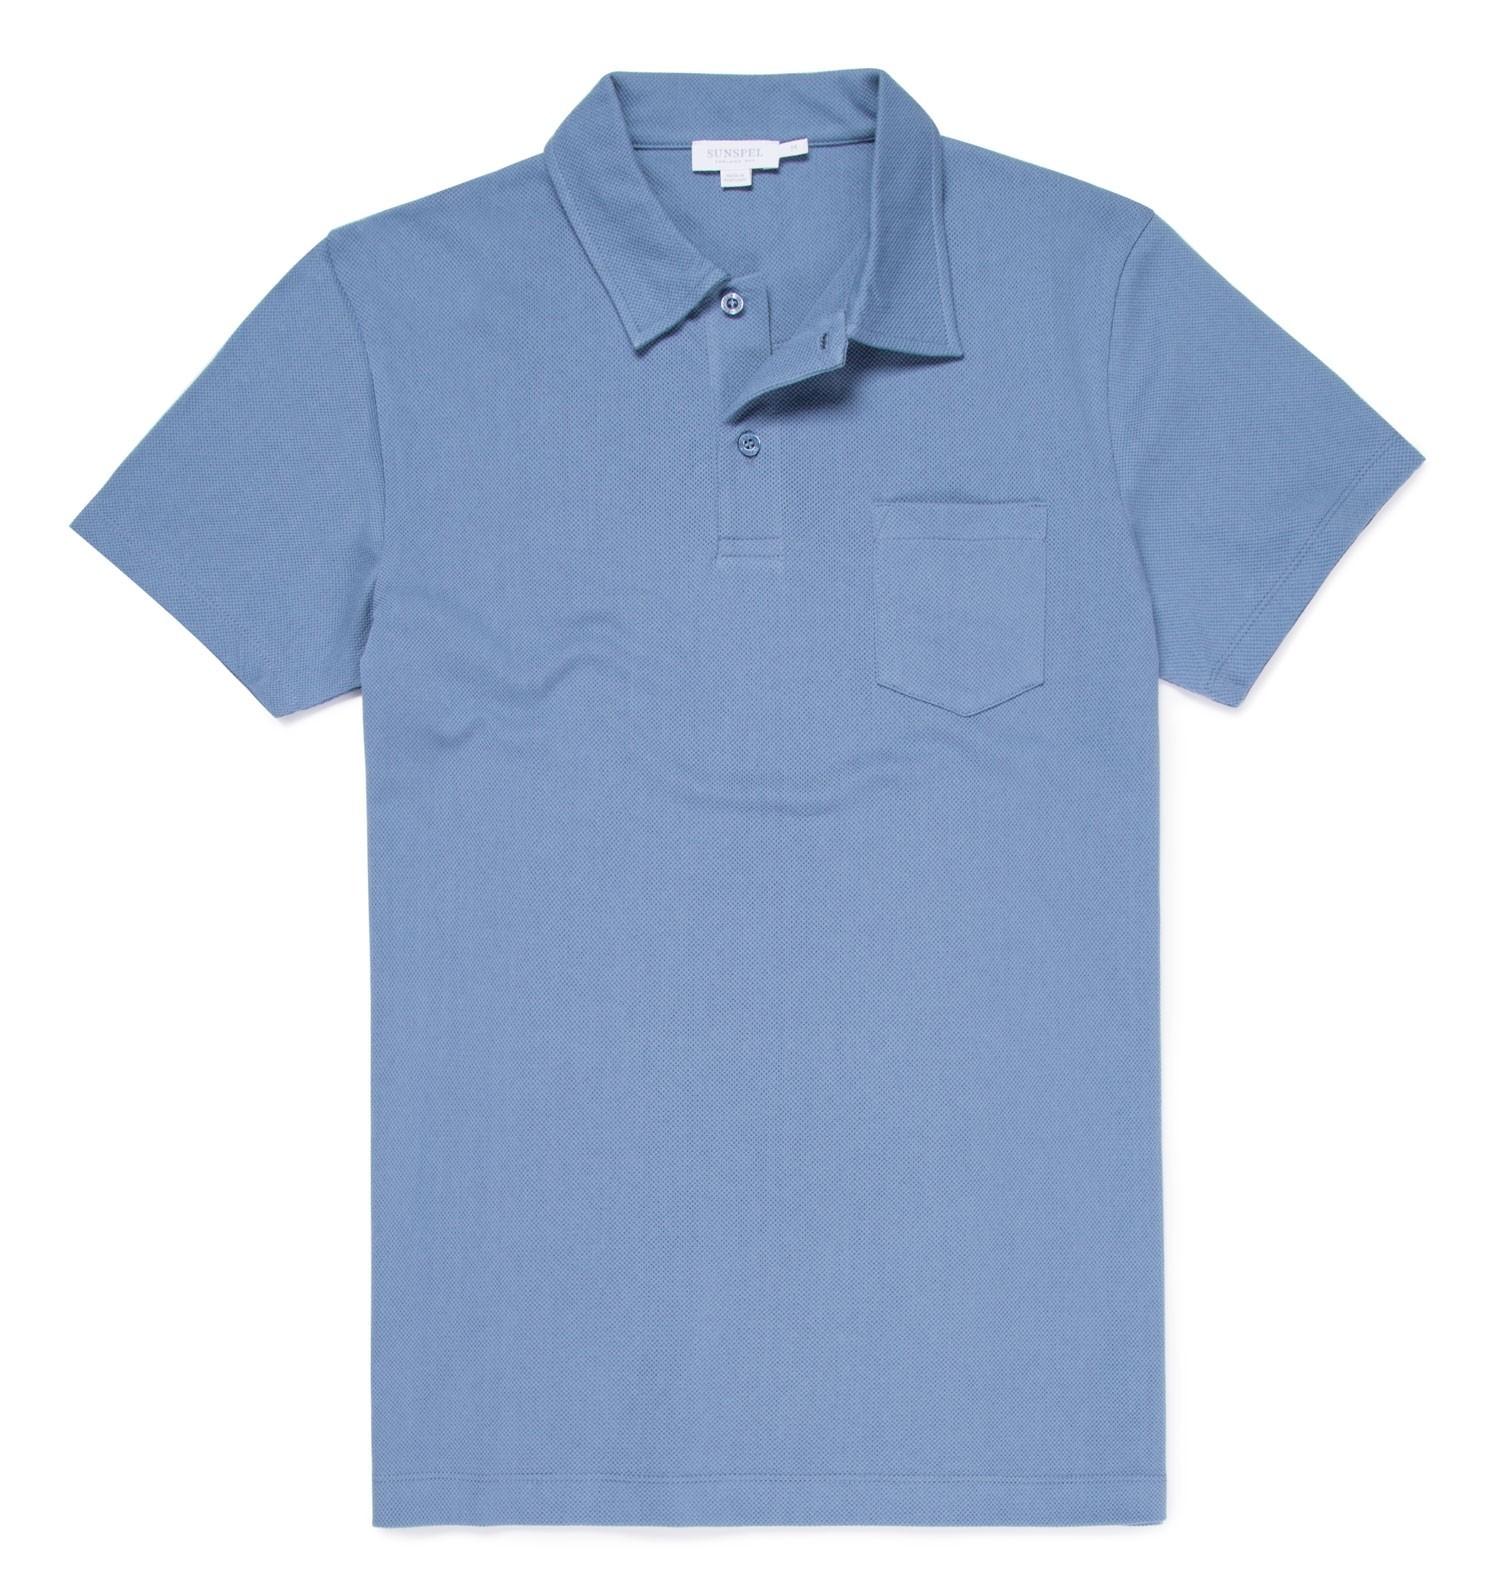 Sunspel Riviera Polo Shirt: Airforce Blue